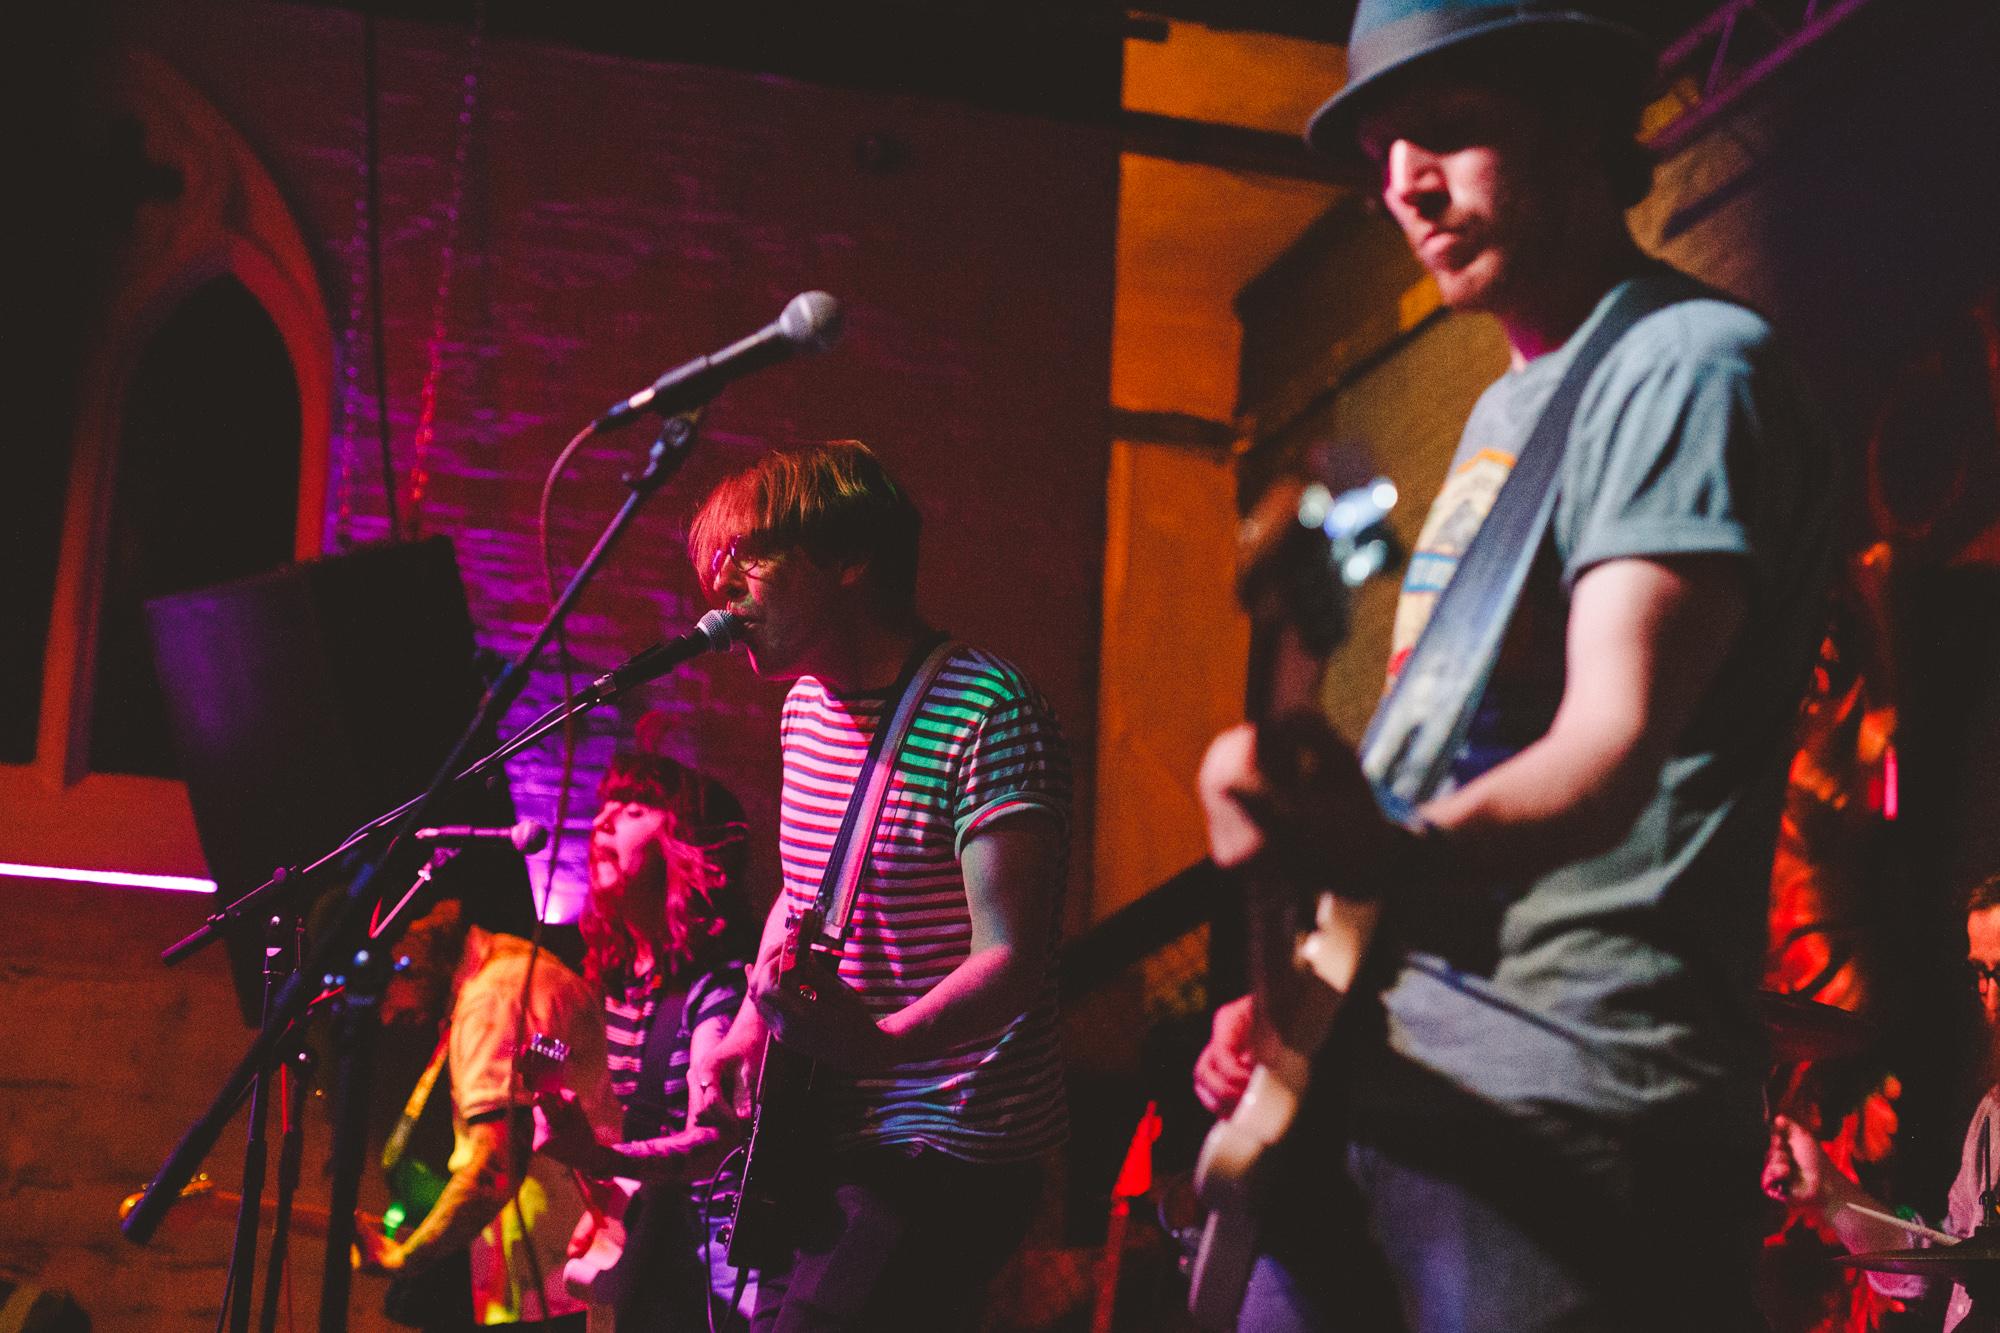 live-music-photography-london-uk-johnny-foreigner-camden-26.jpg